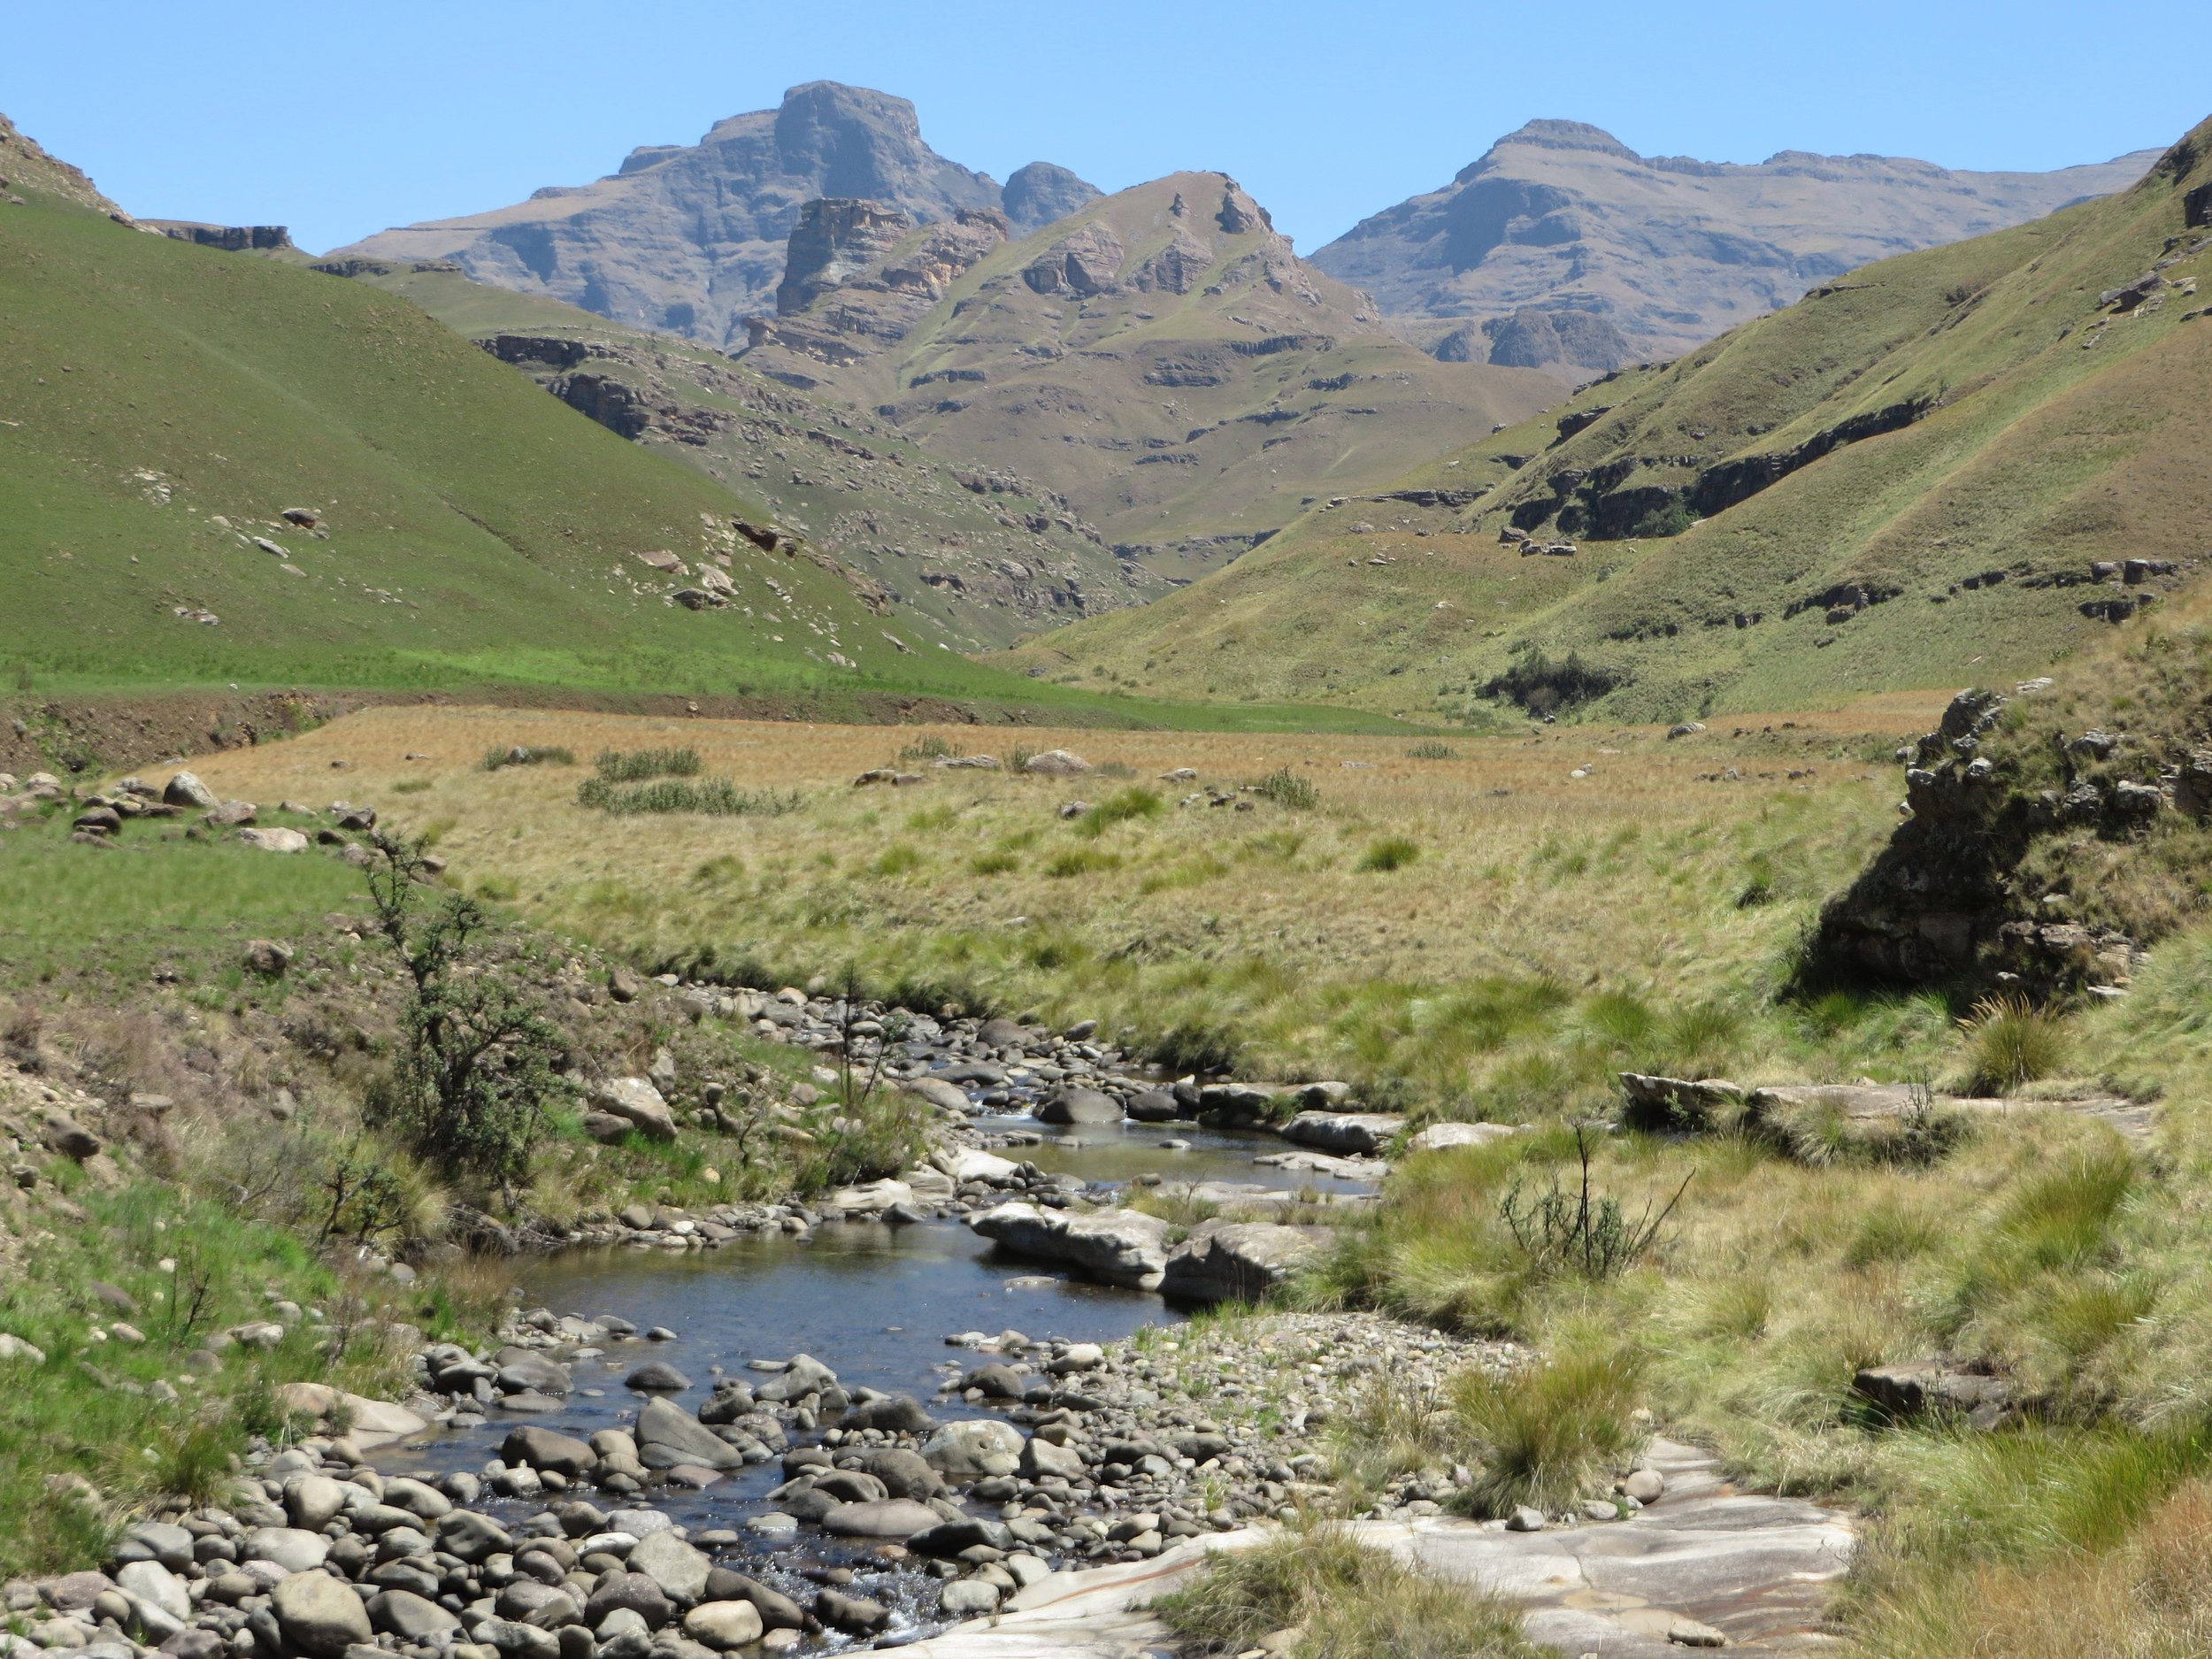 Underberg vistas: a perfect setting for a meditative retreat weekend